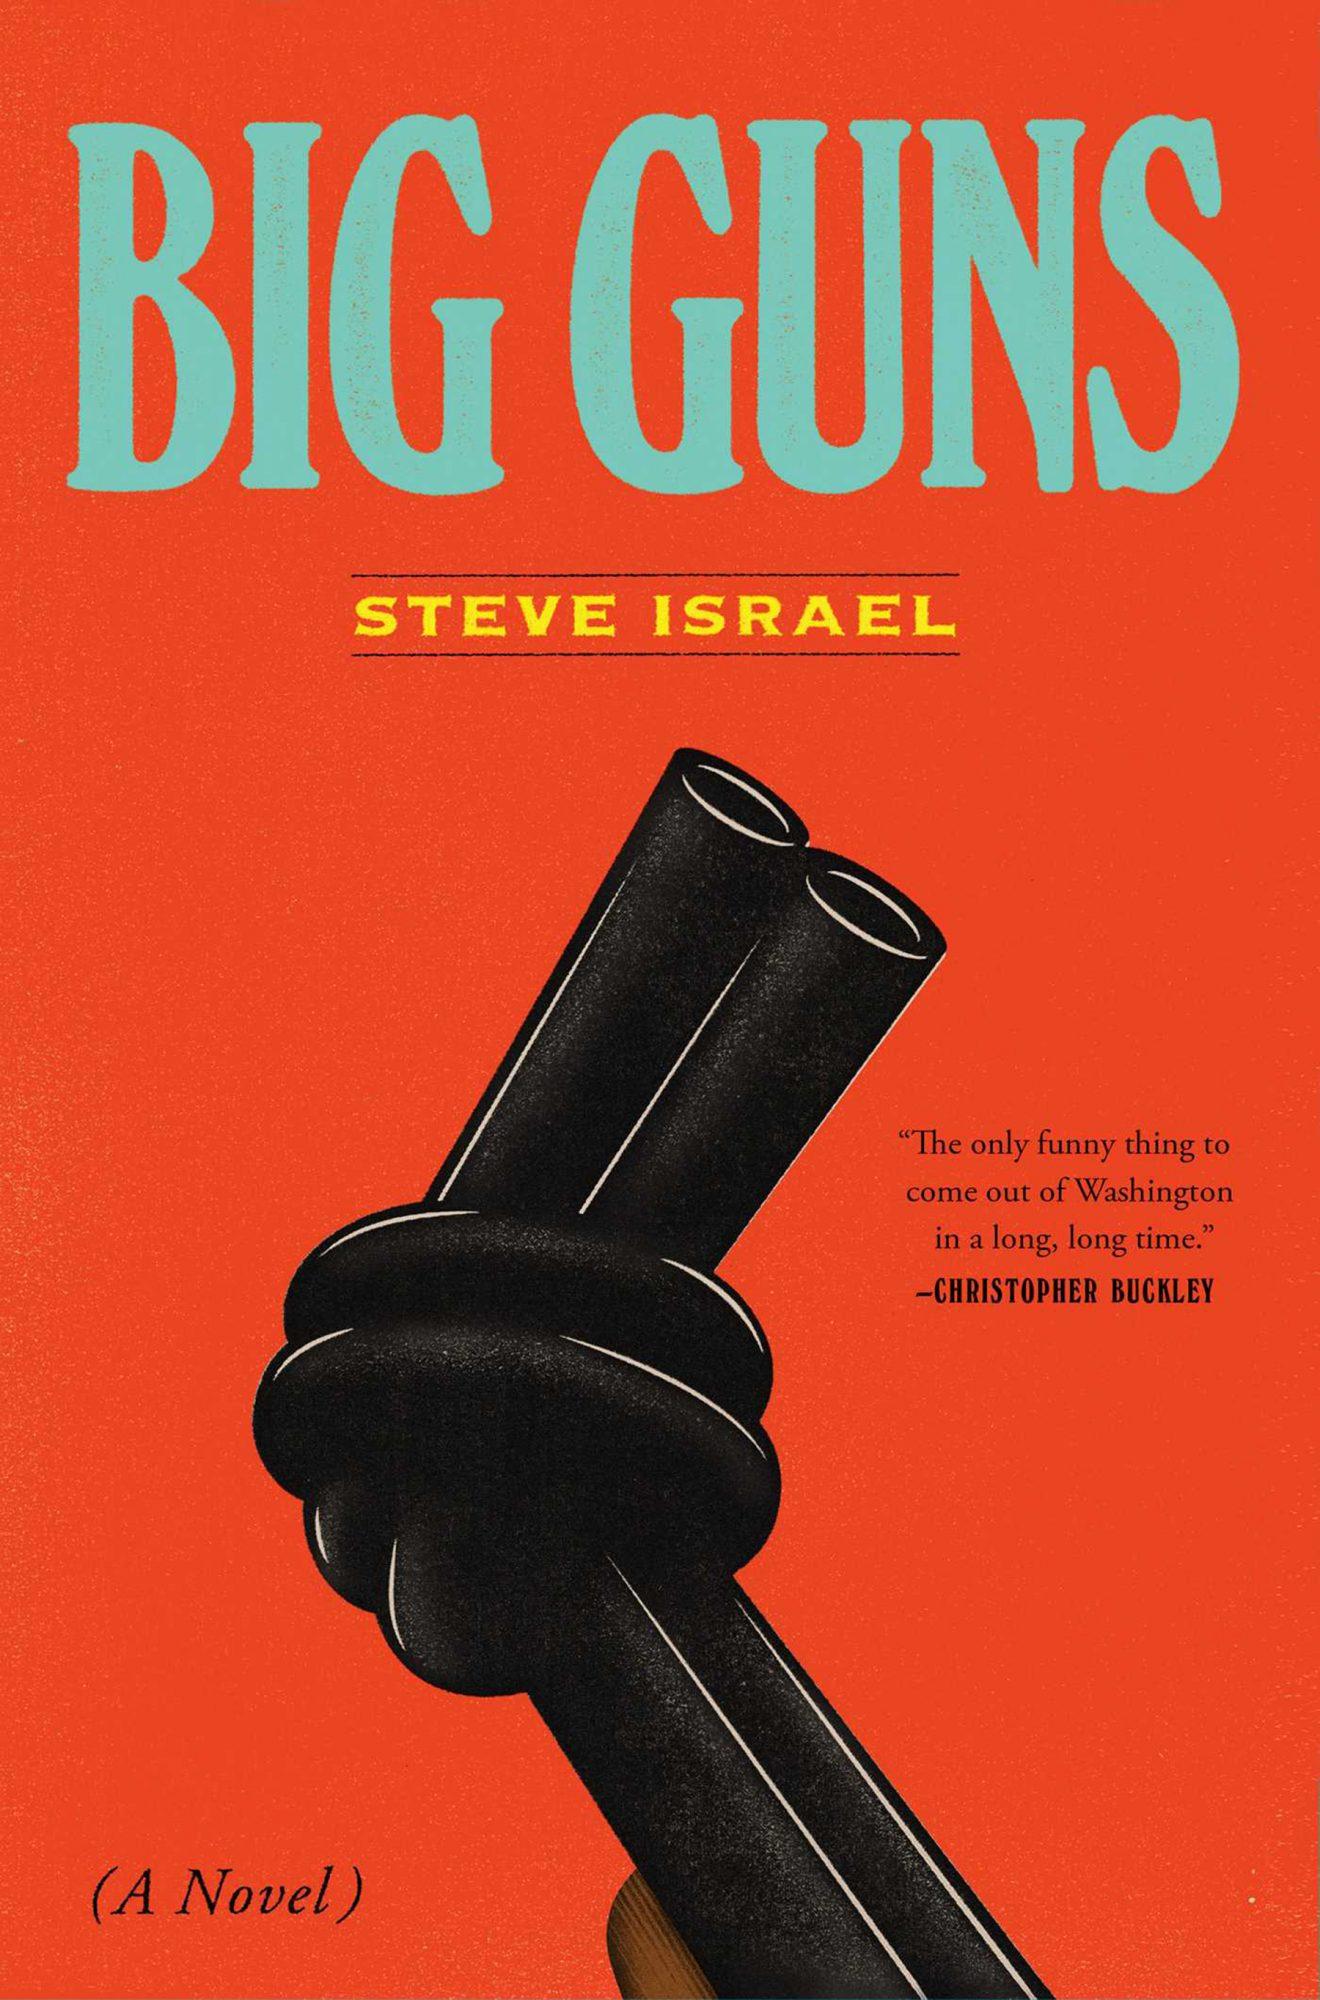 Big-Guns